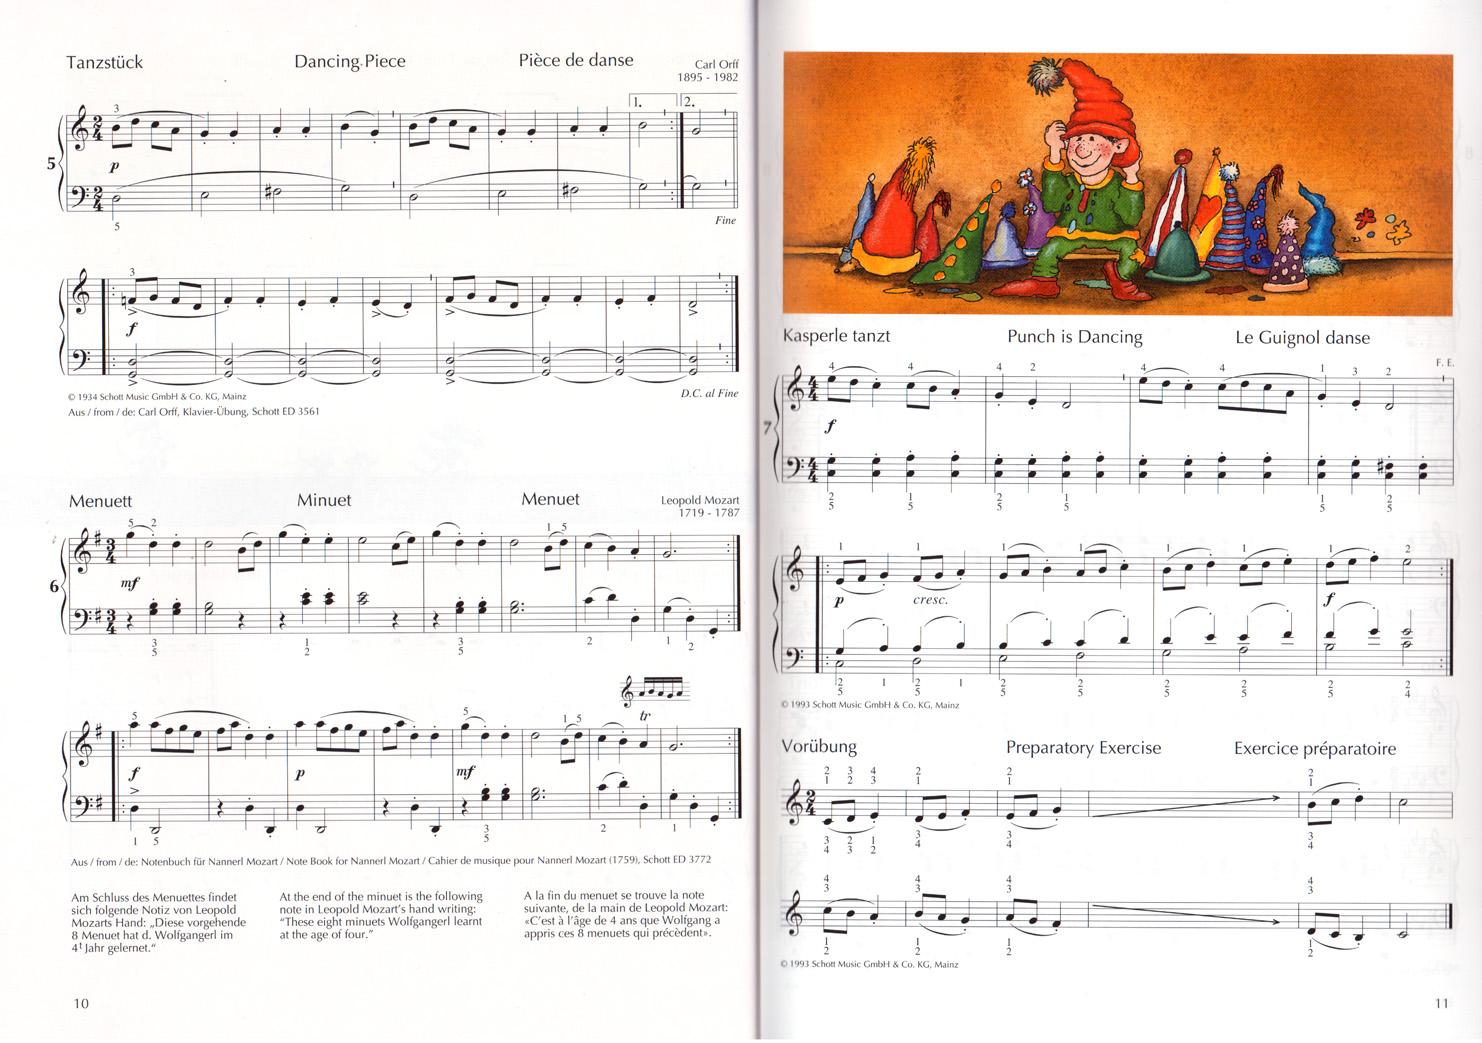 Europäische Klavierschule Band 2 Cd Schott Musik 7932 50 9783795754365 Ebay